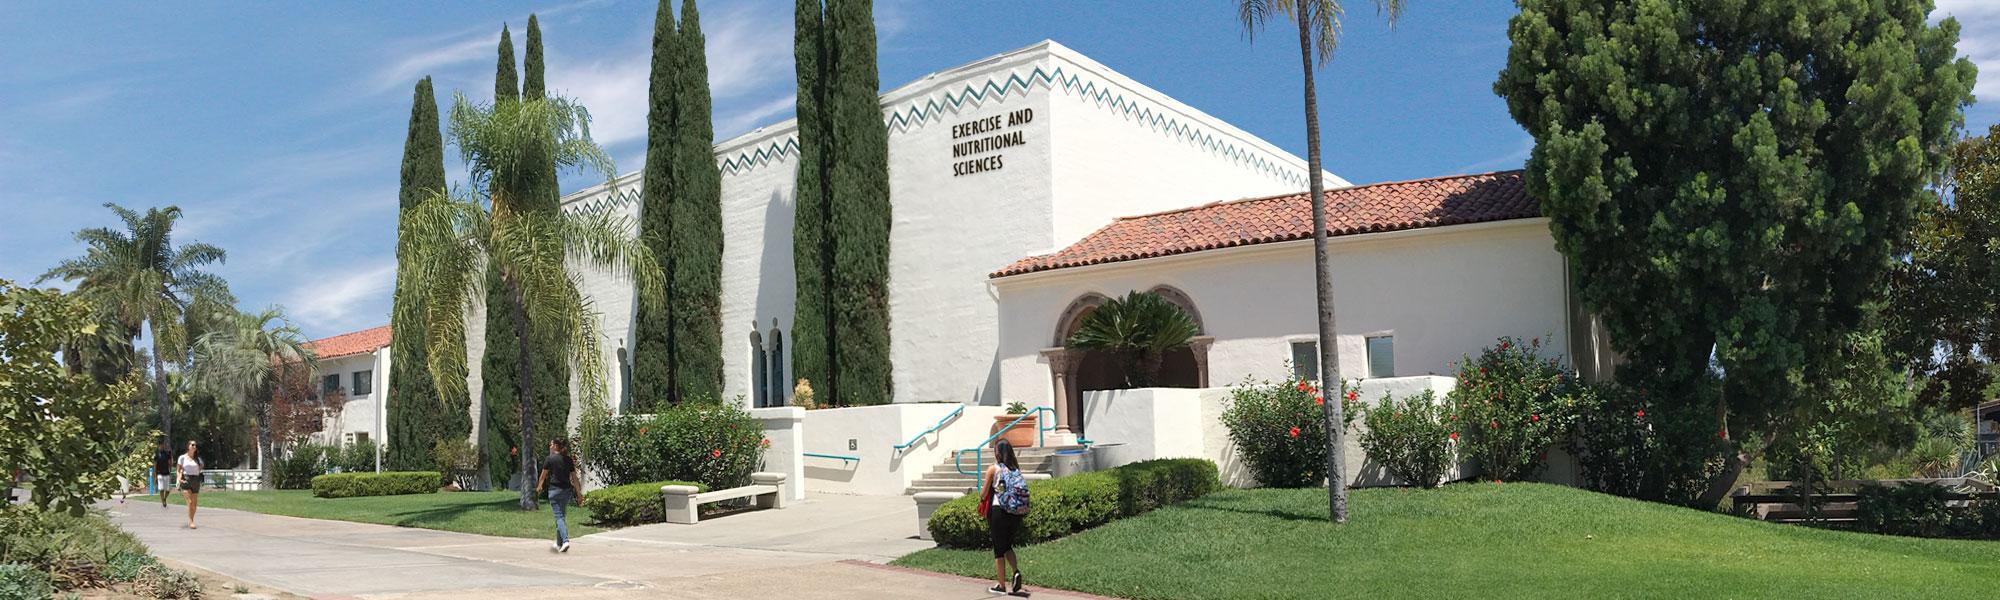 Sdsu School Of Exercise Nutritional Sciences San Diego California